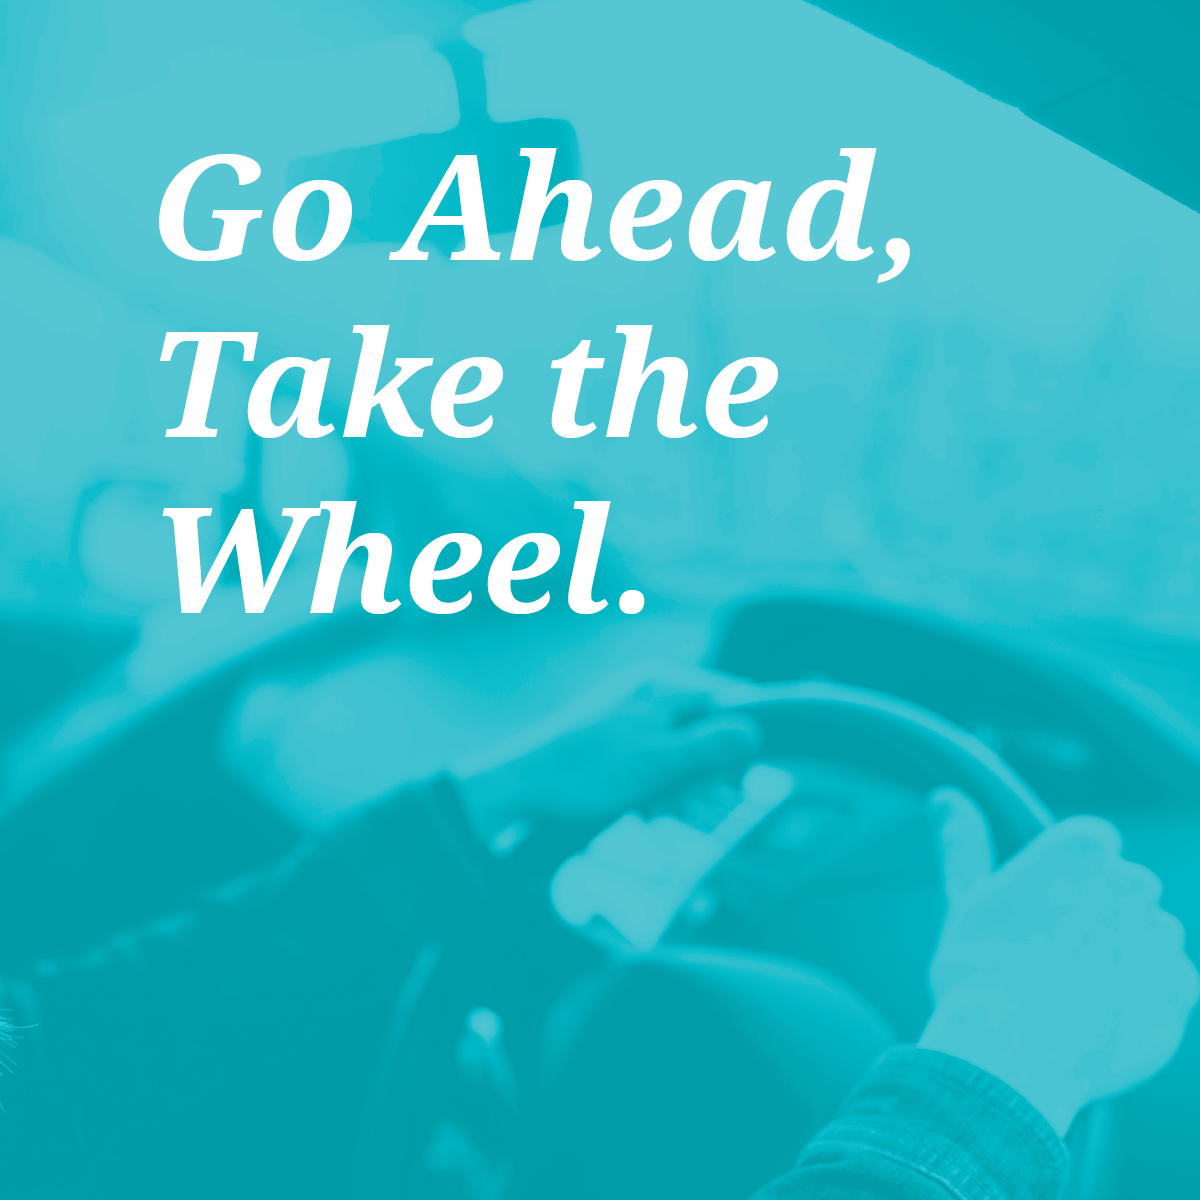 Go Ahead, Take the Wheel.